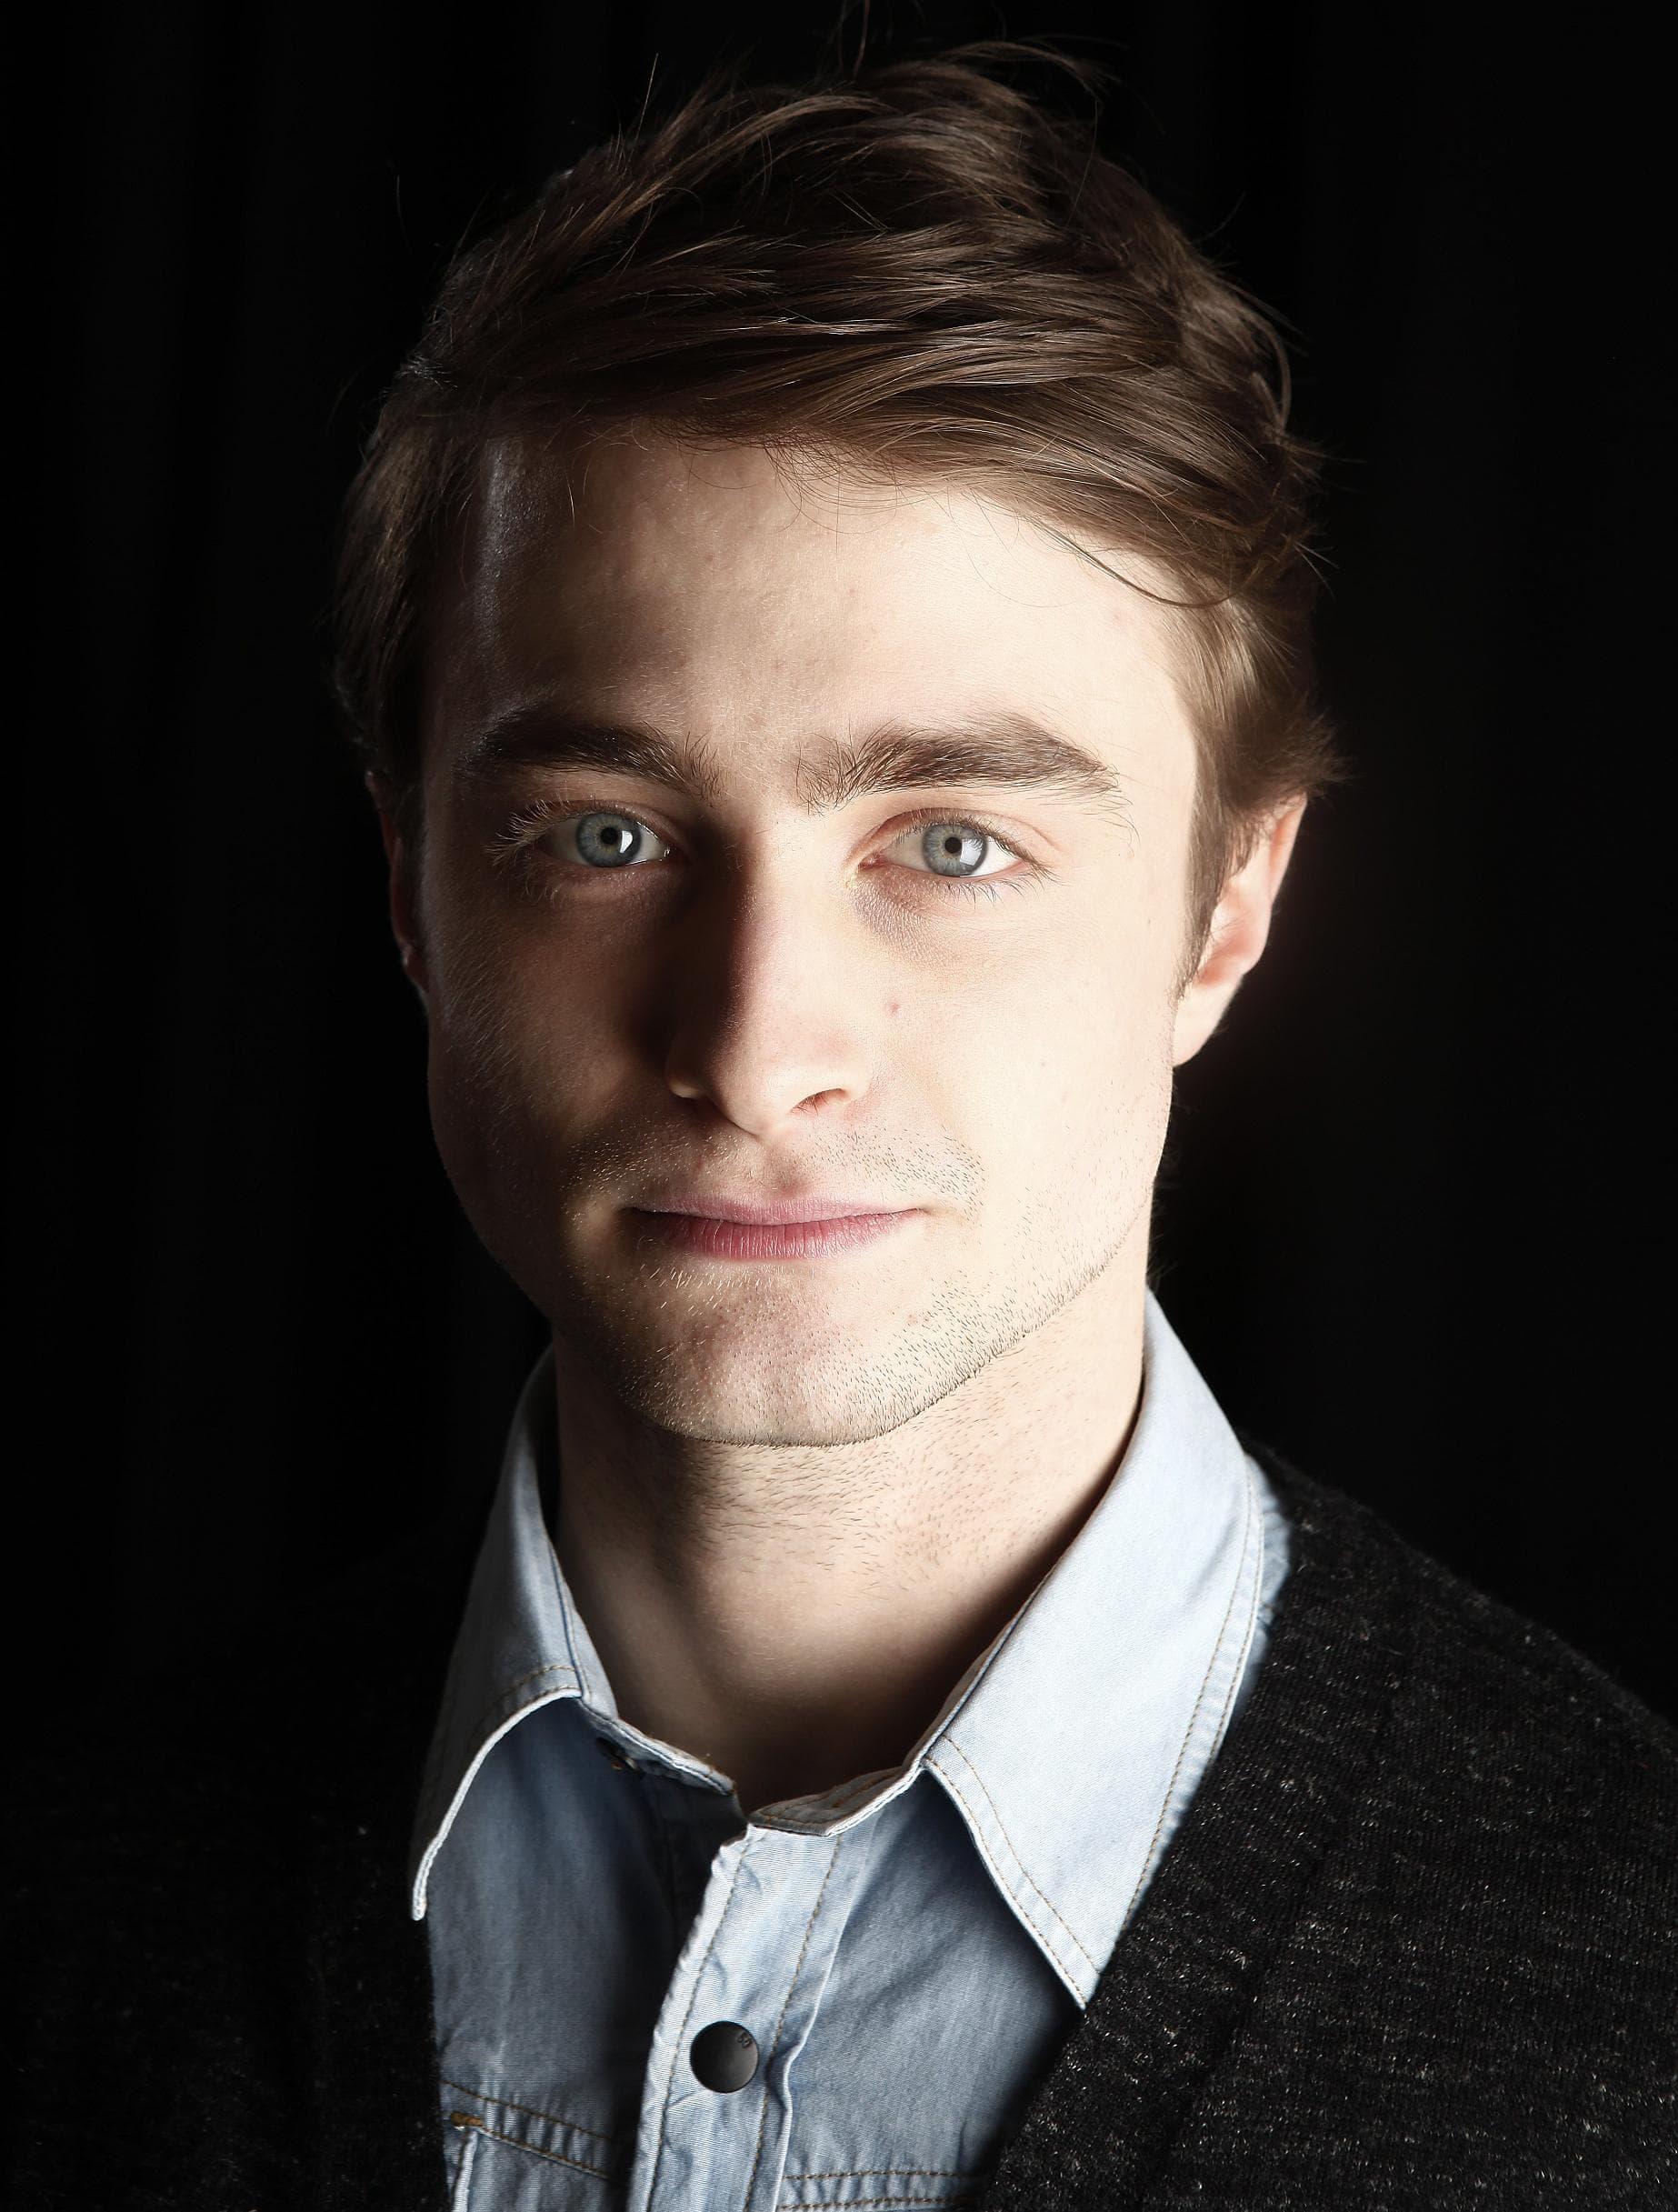 Daniel Radcliffe For mobile